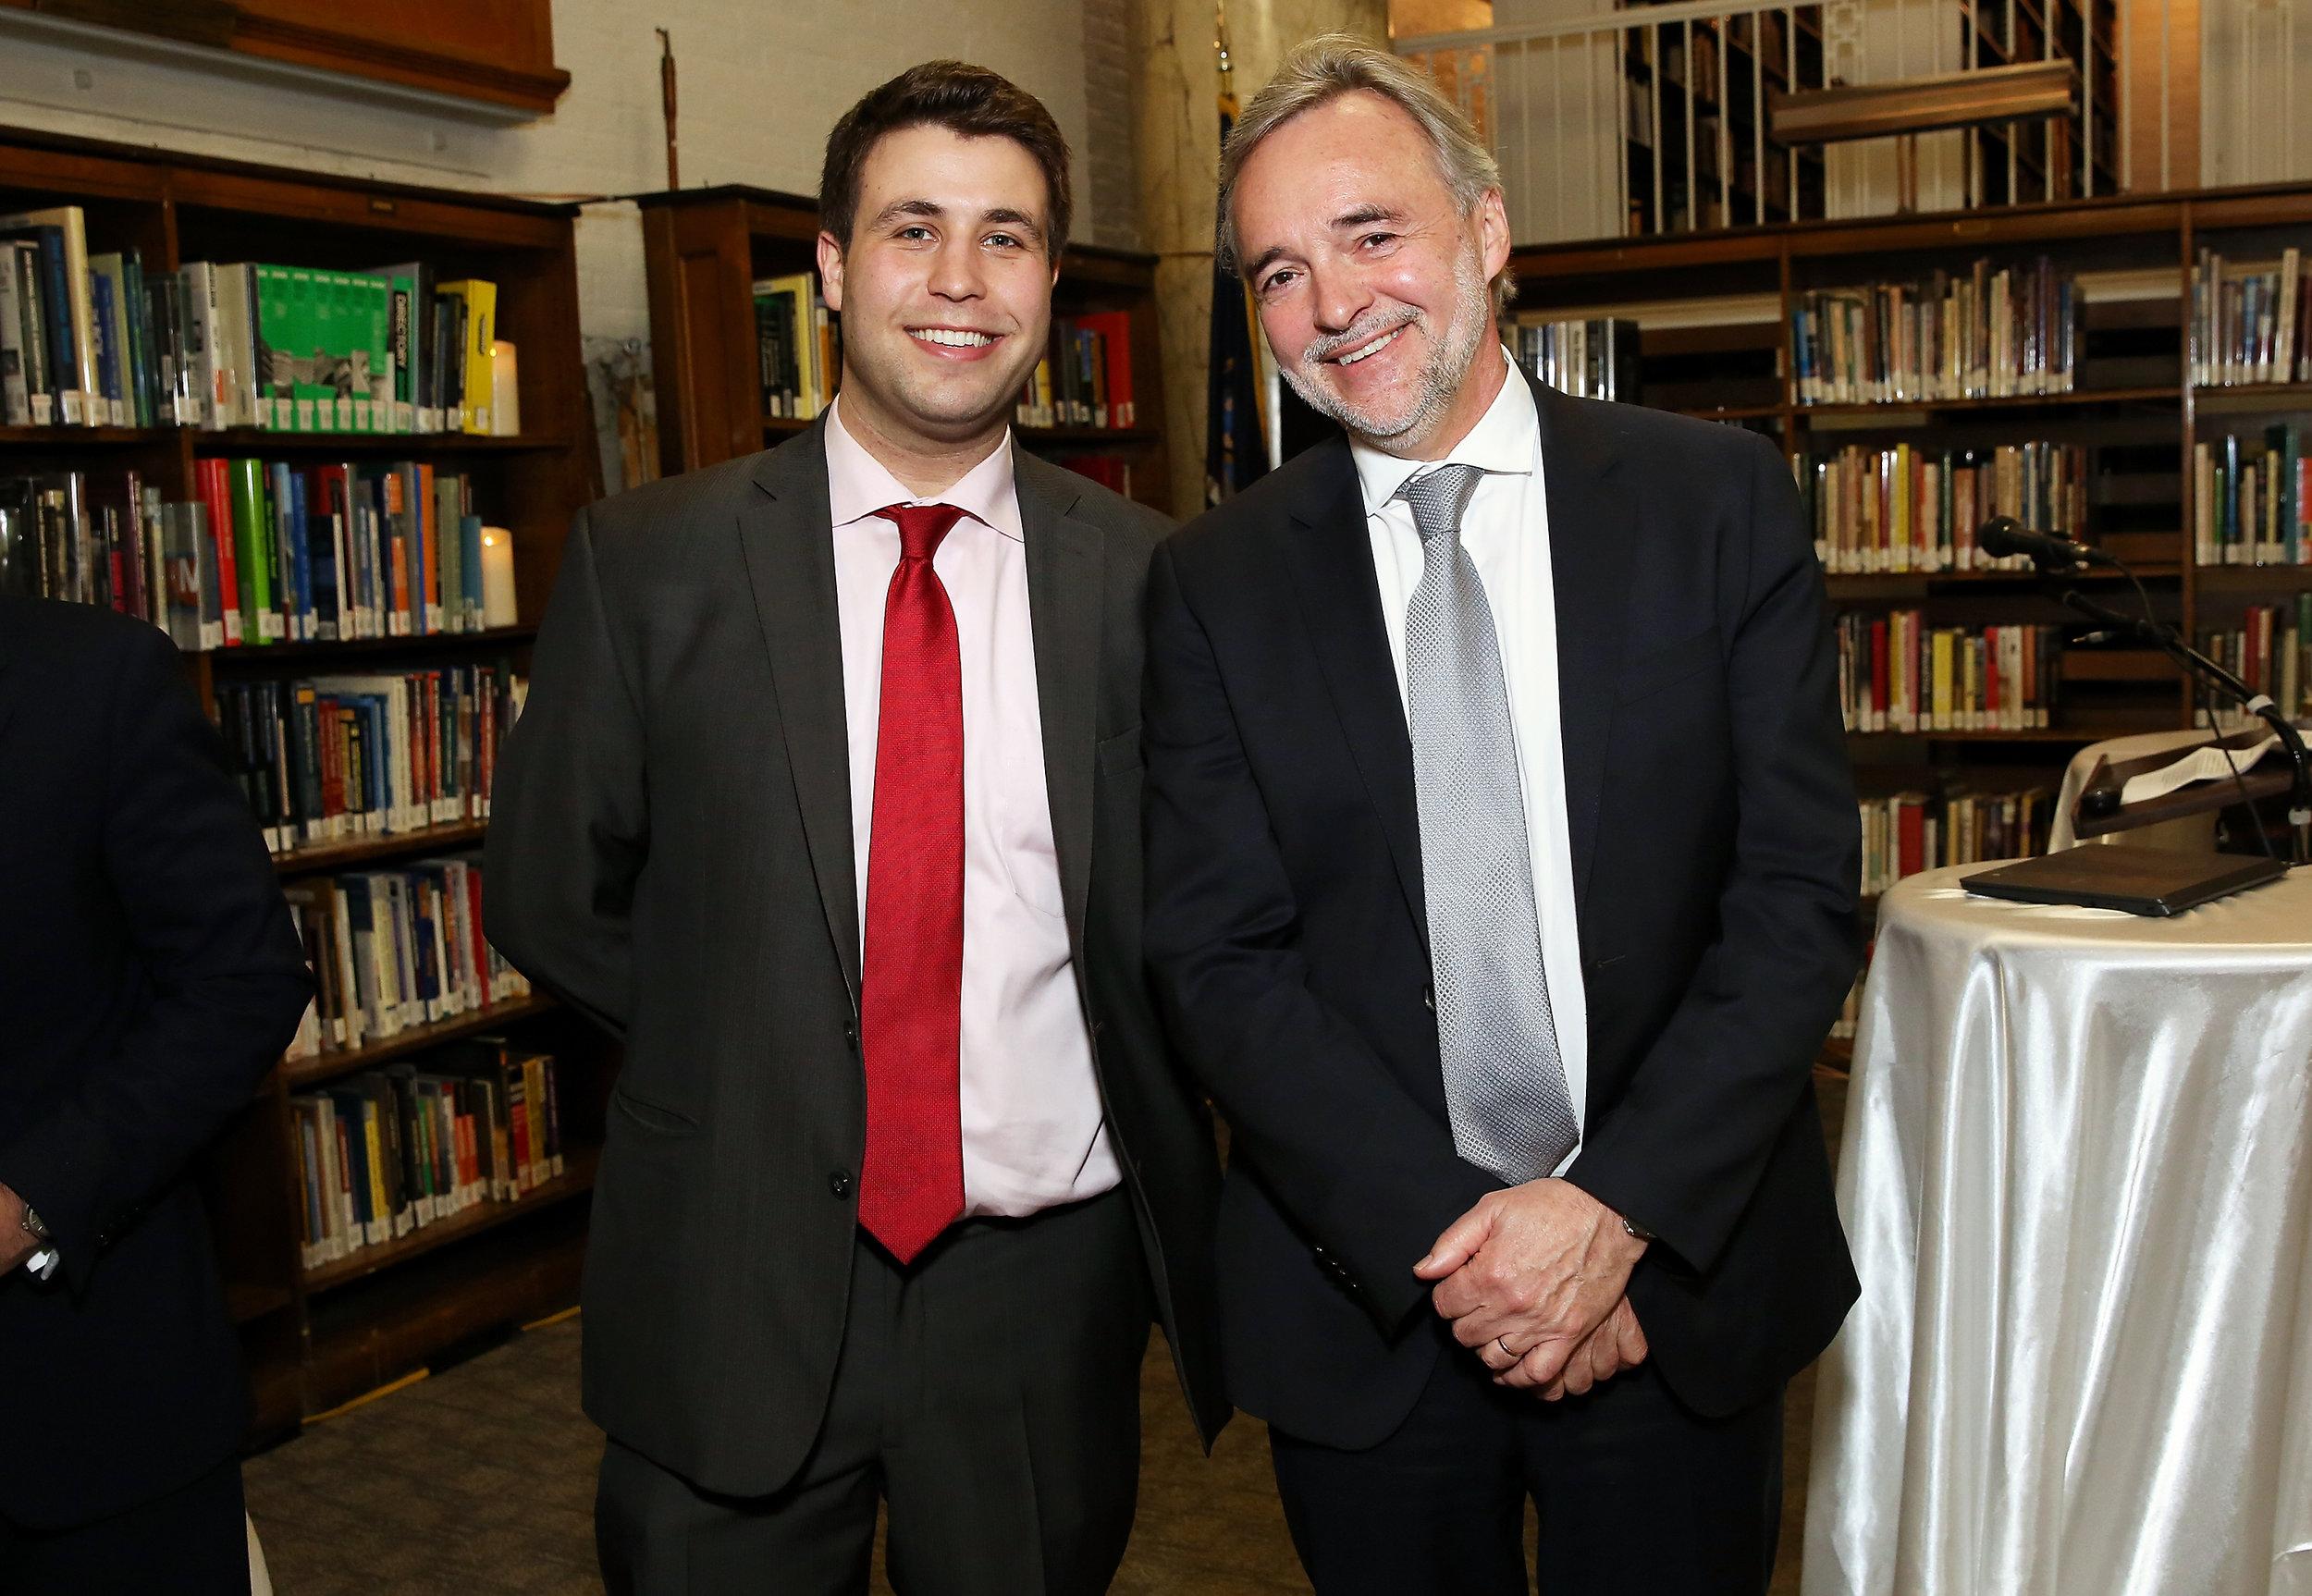 Michael Fossner and Nicholas Dawes